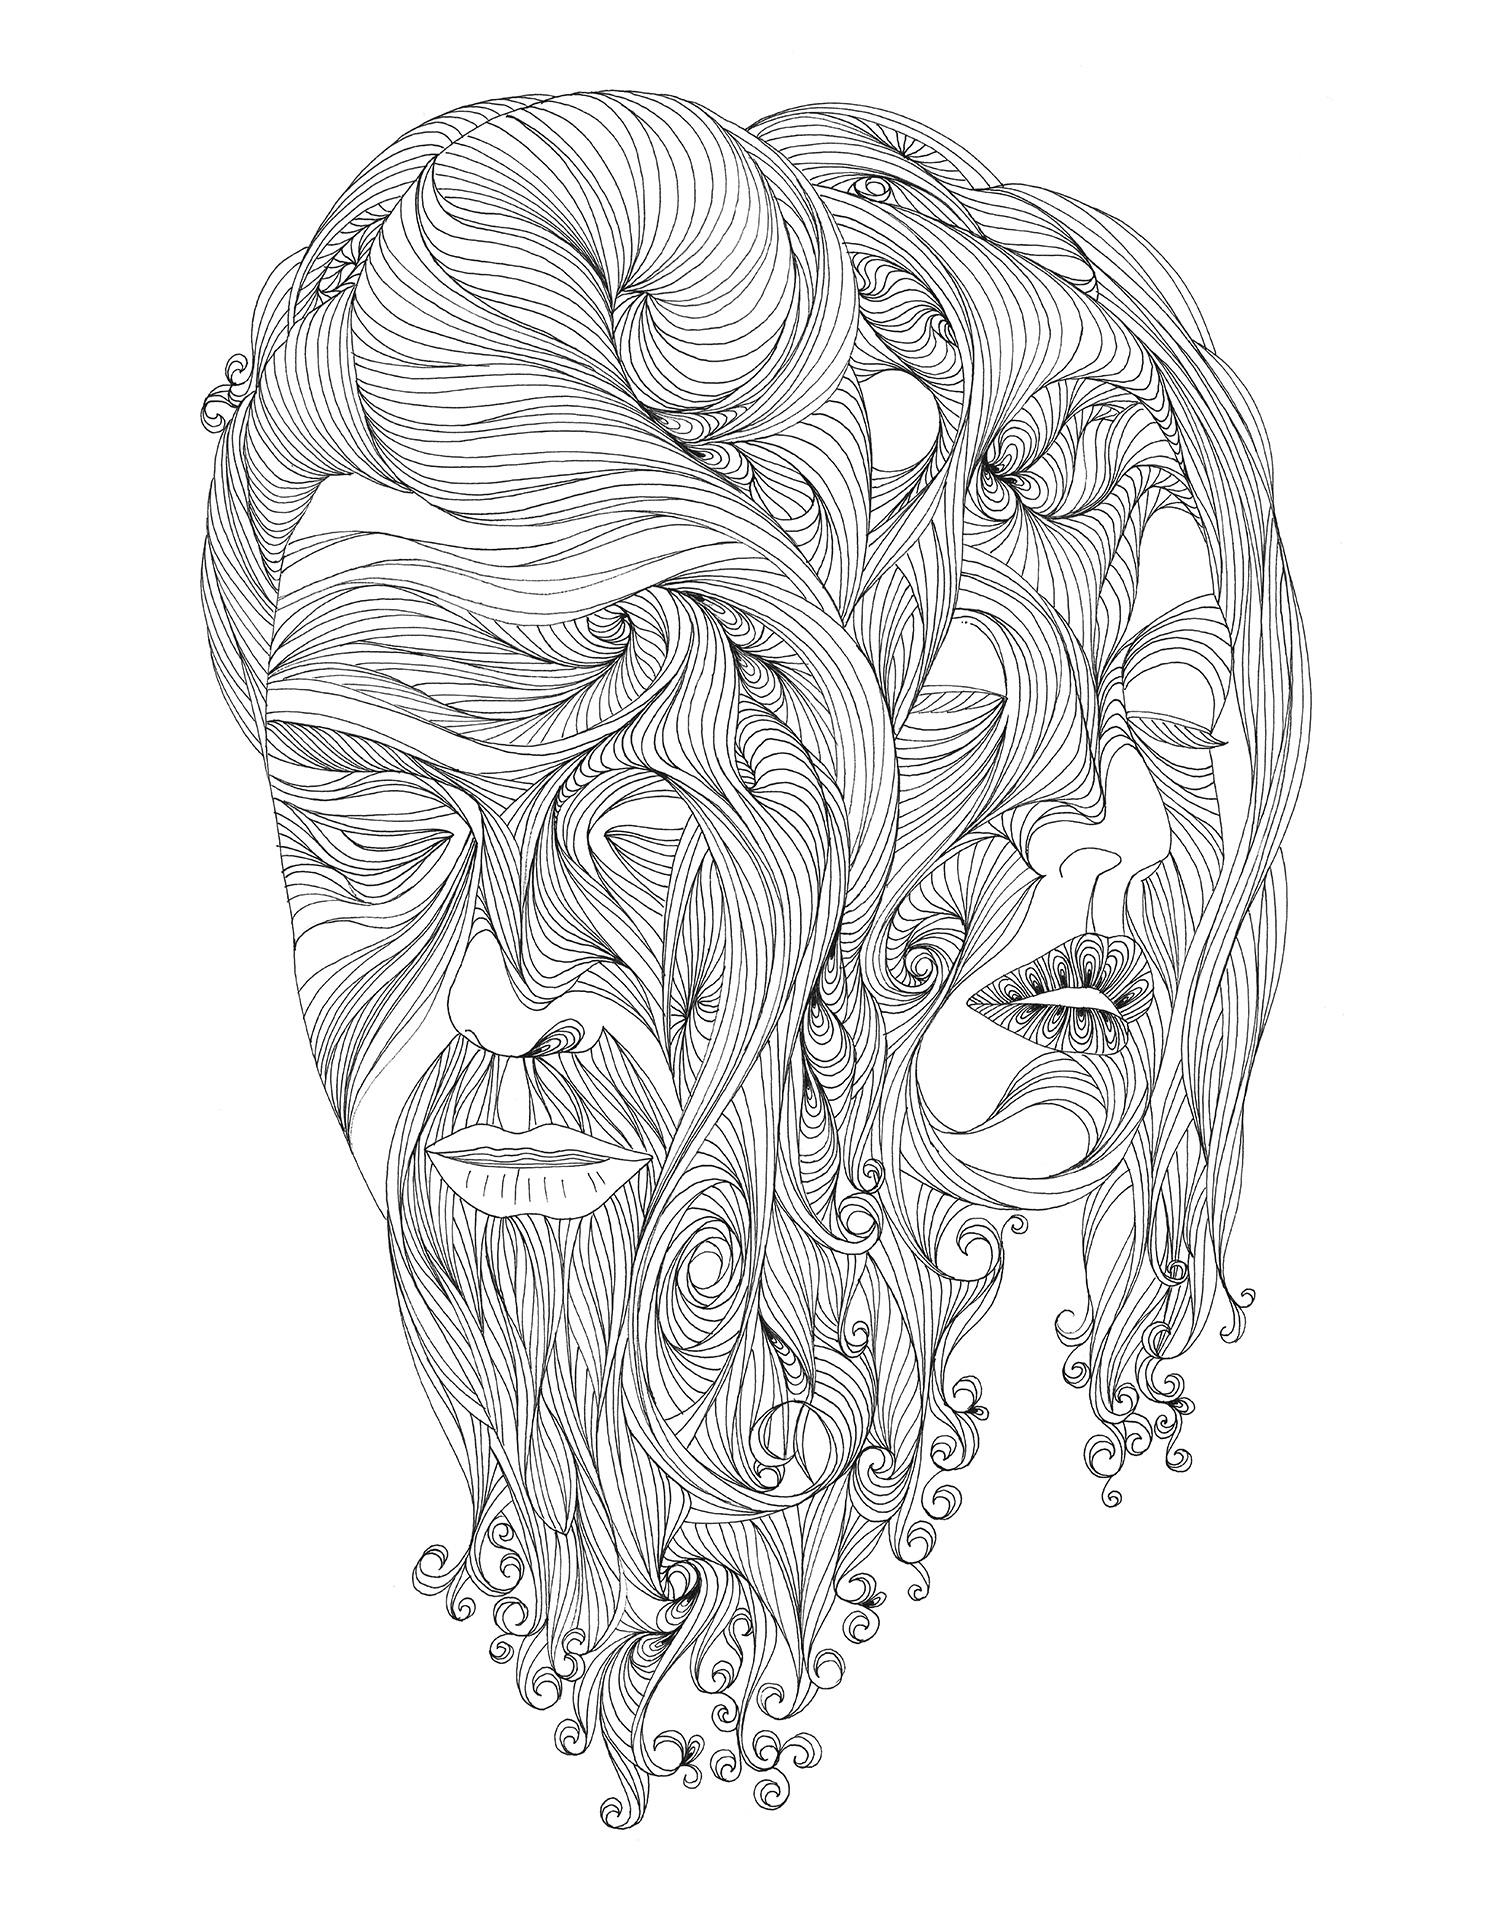 illustration_susanngreuel_22